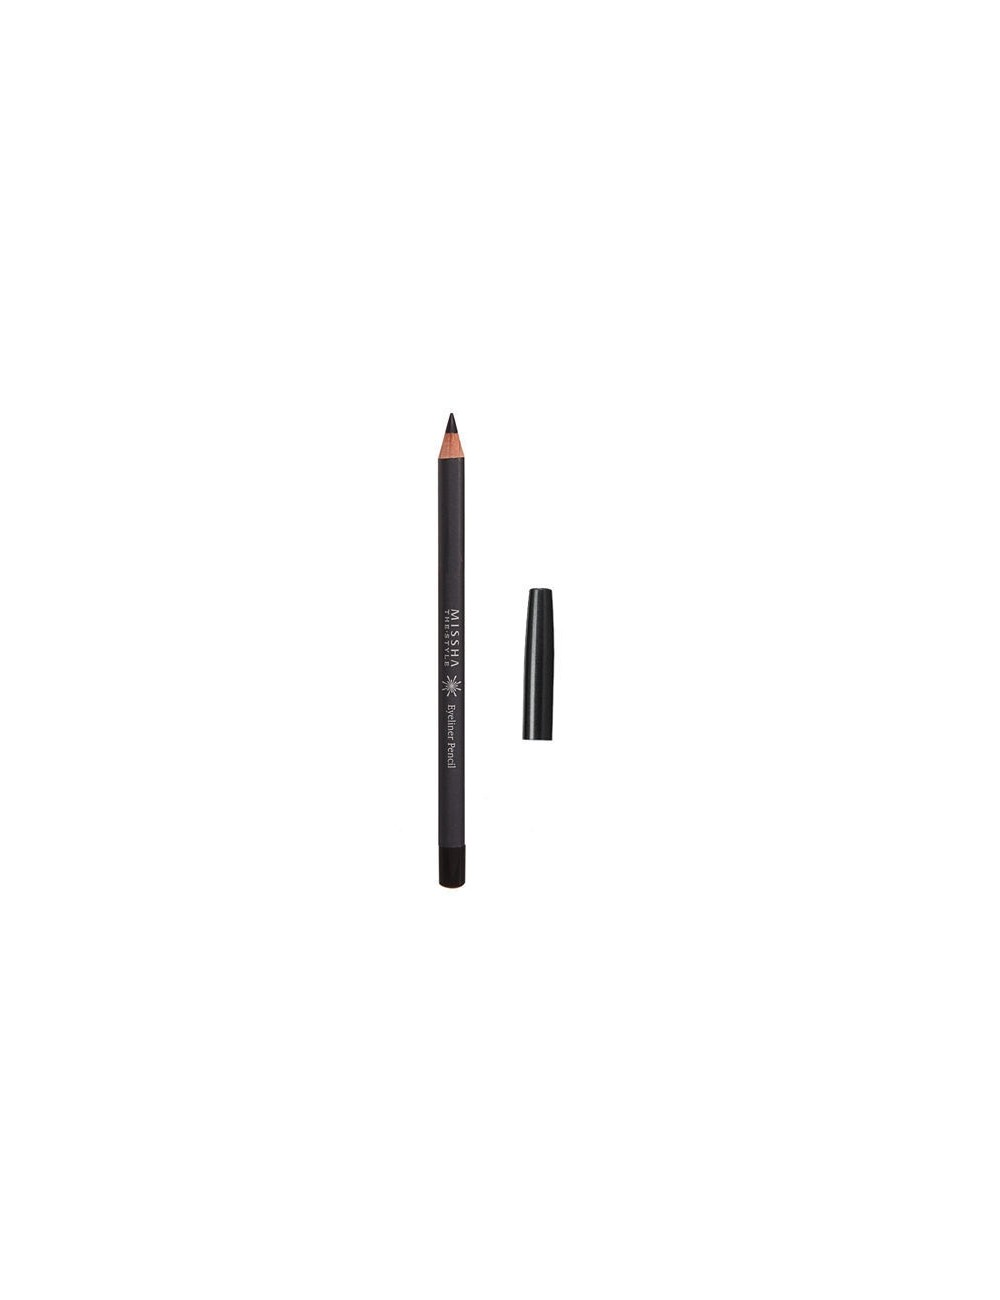 Lápiz para Ojos Negro - Missha The Style Eye Liner